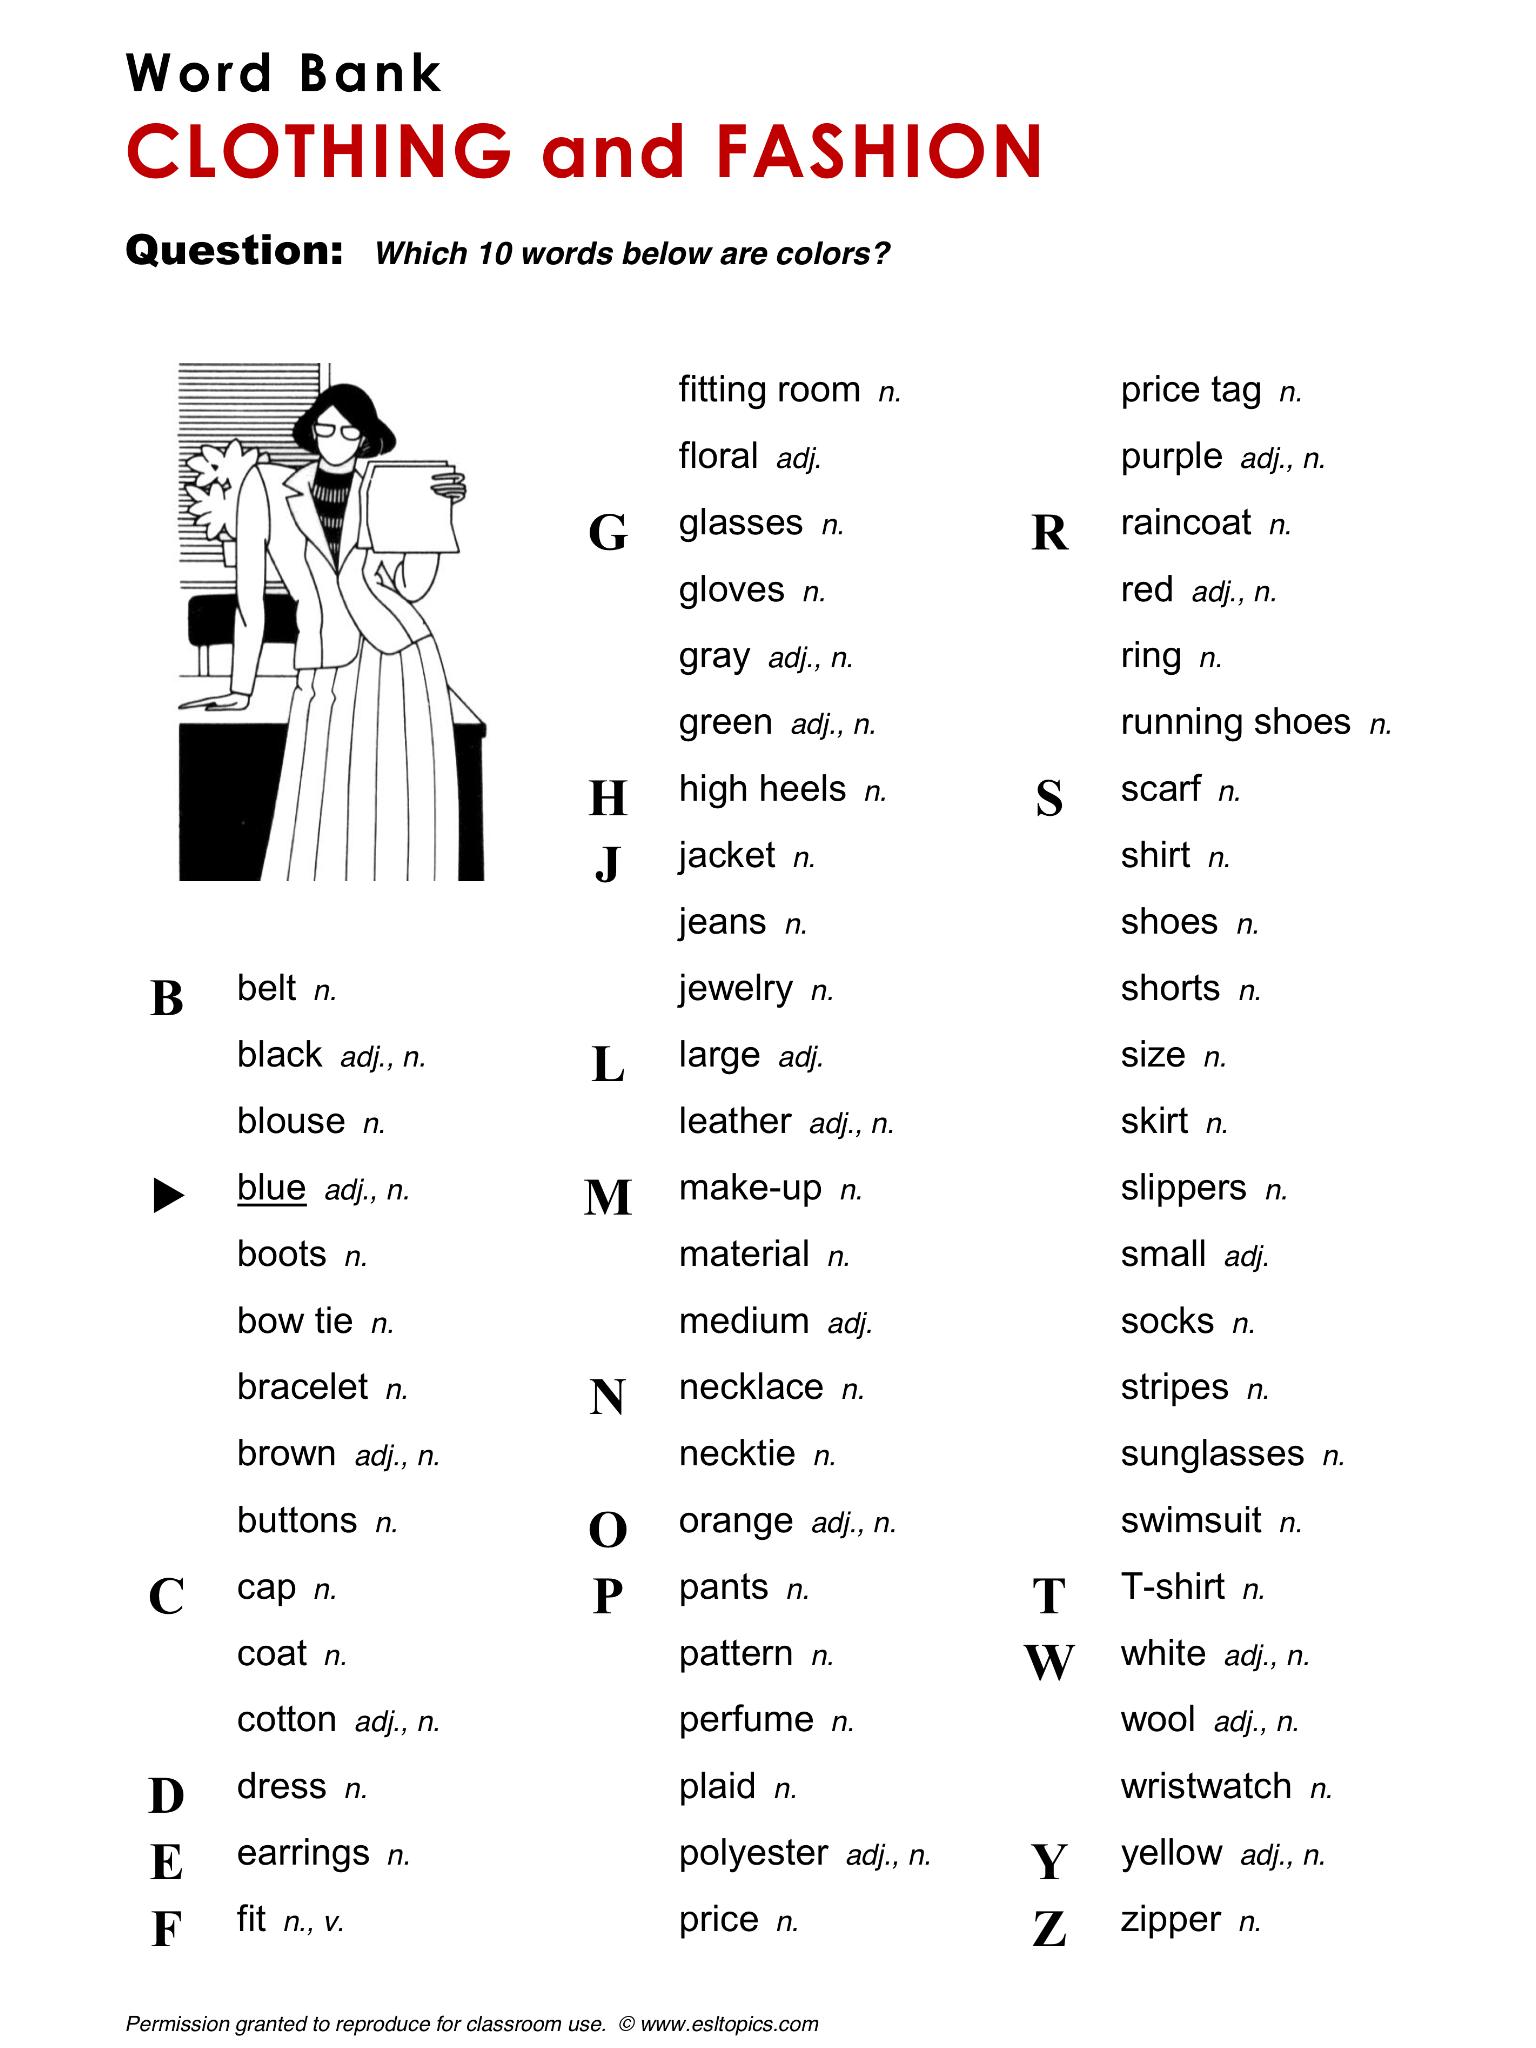 Clothing And Fashion Clothes Vocabulary Esl English